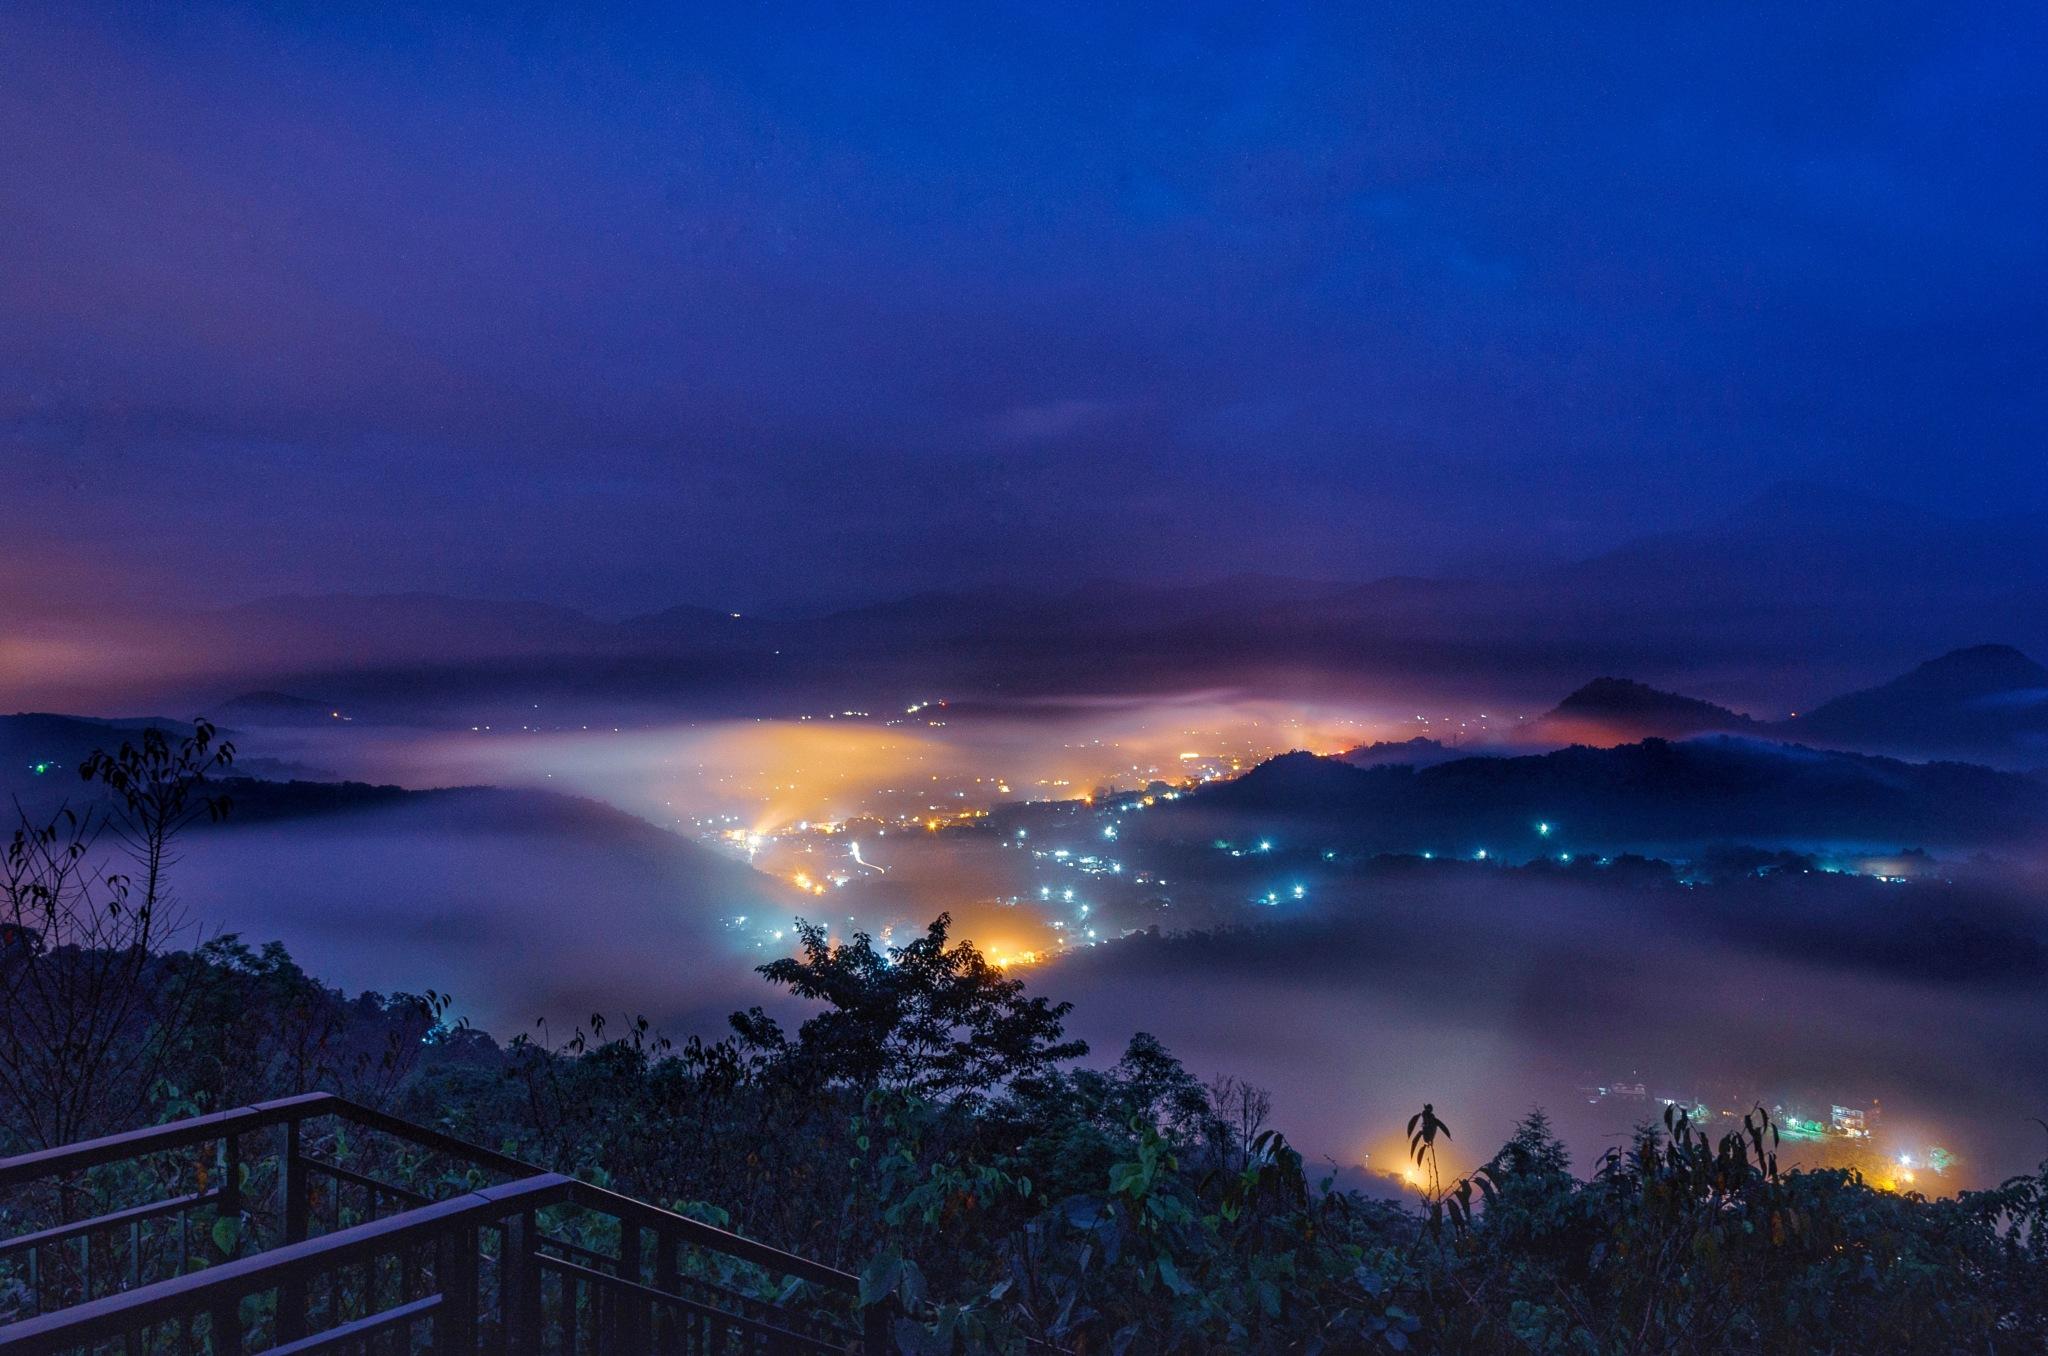 Cloud sea by C.bye